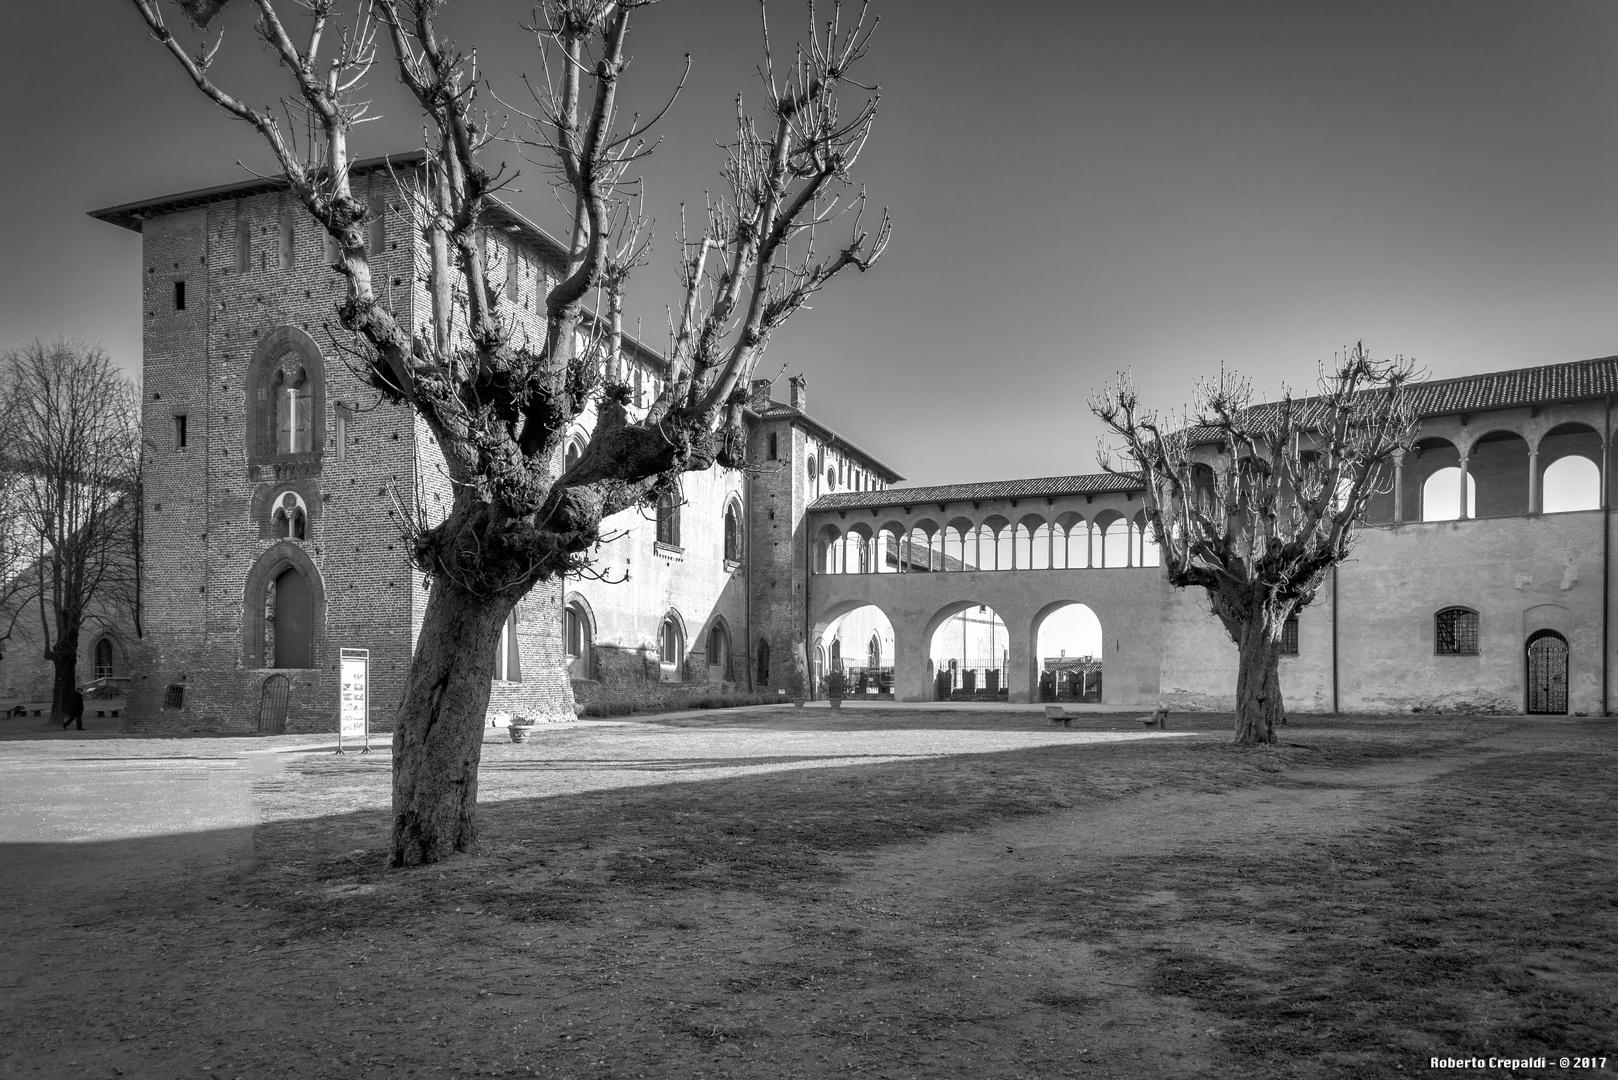 Vigevano, Castello Sforzesco